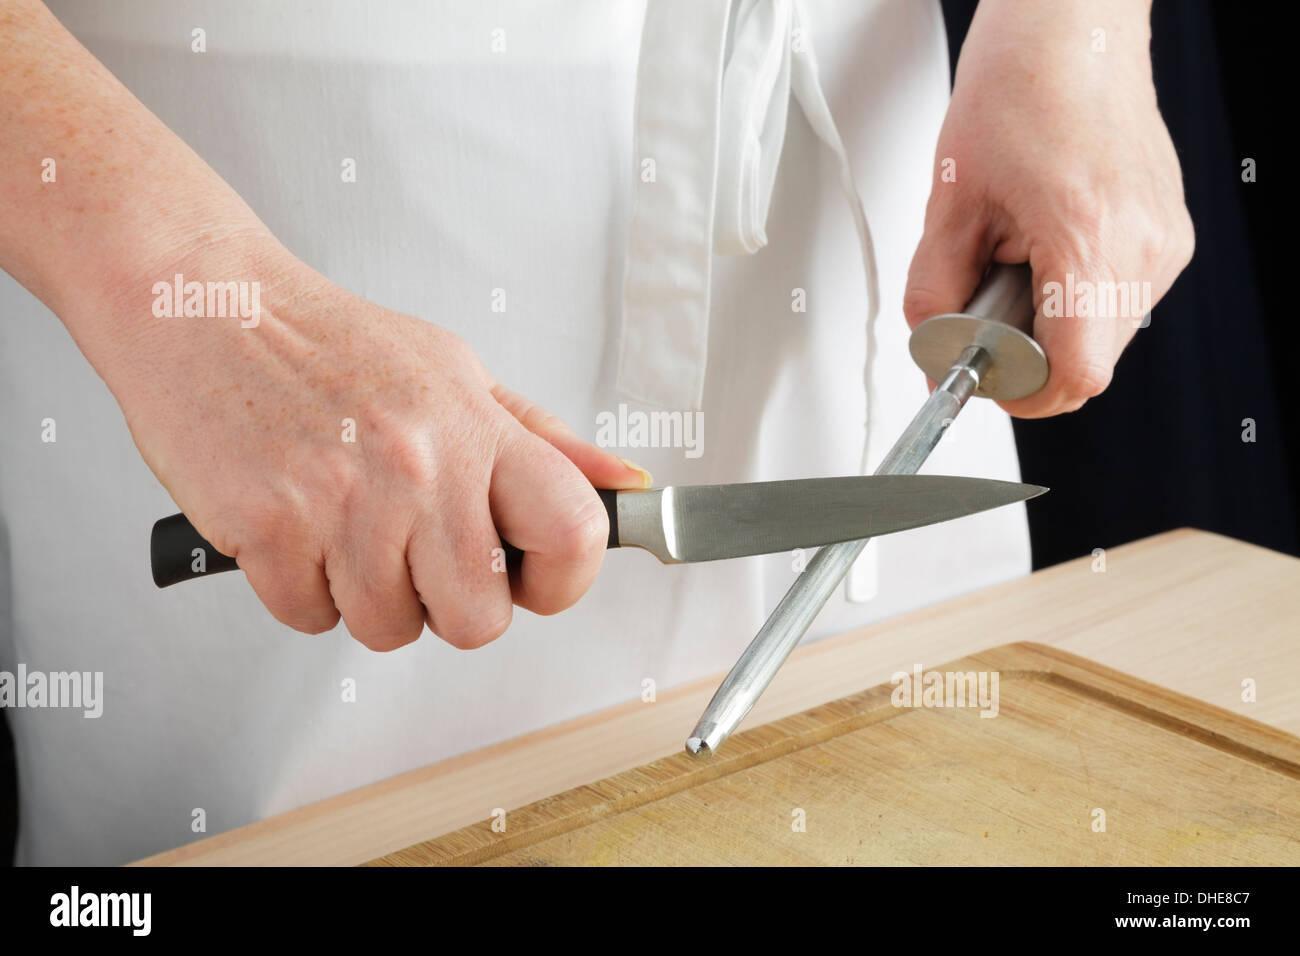 Using a kitchen knife sharpener - Stock Image